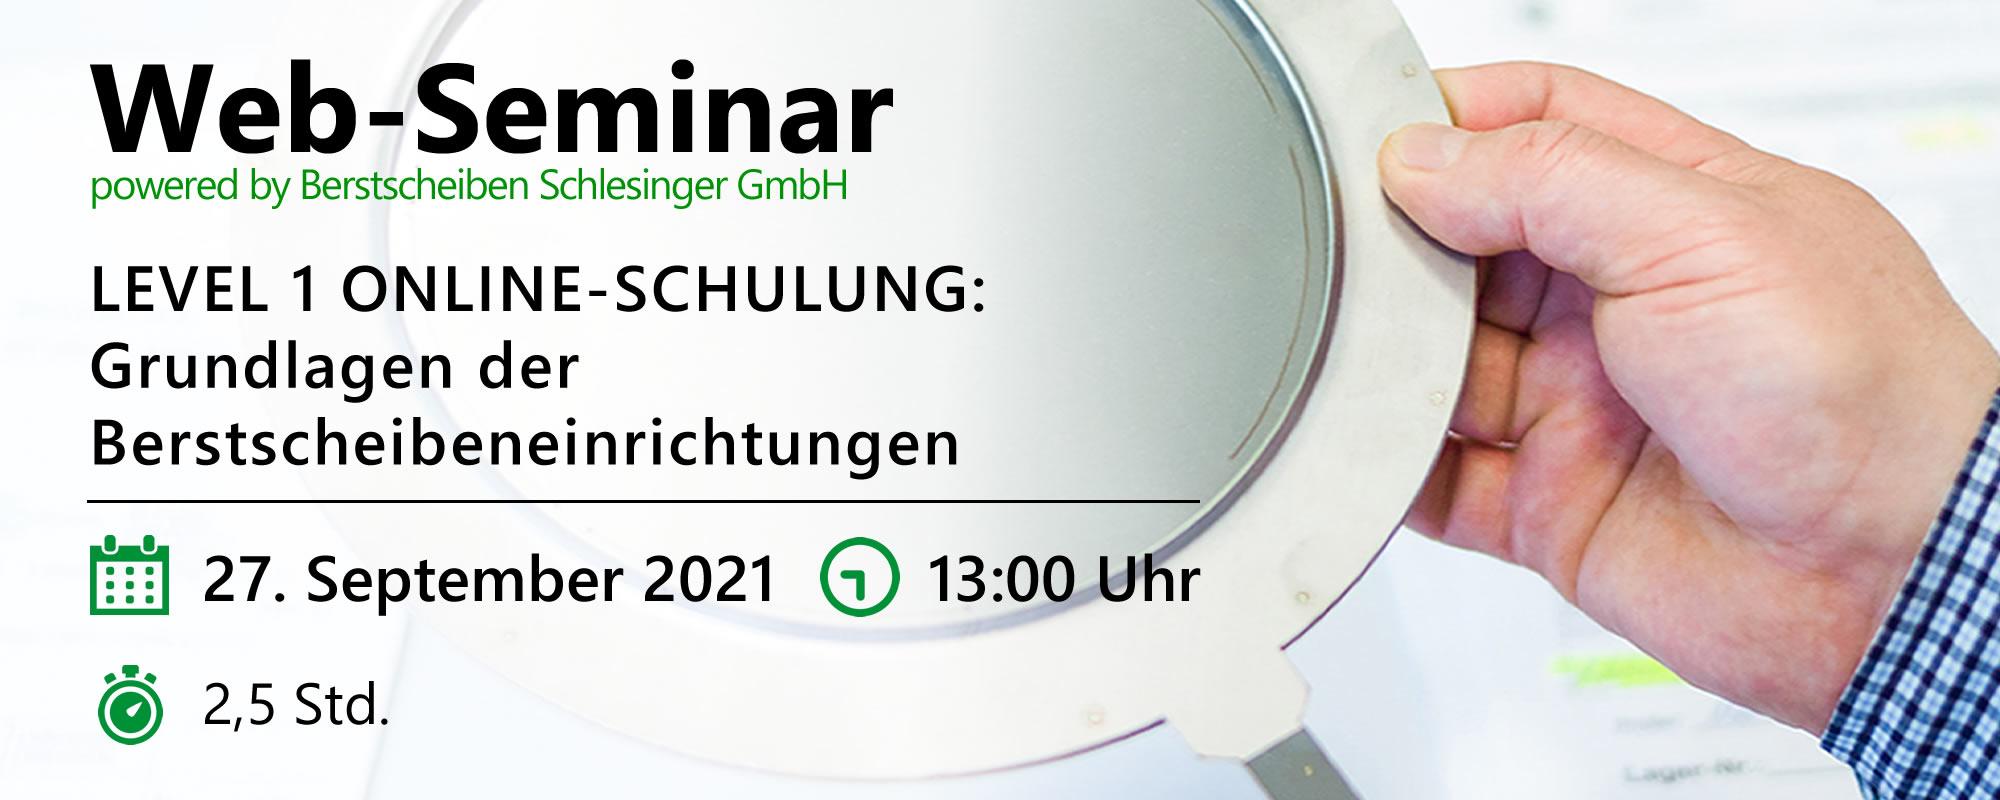 Web-Seminar am 27.09.2021